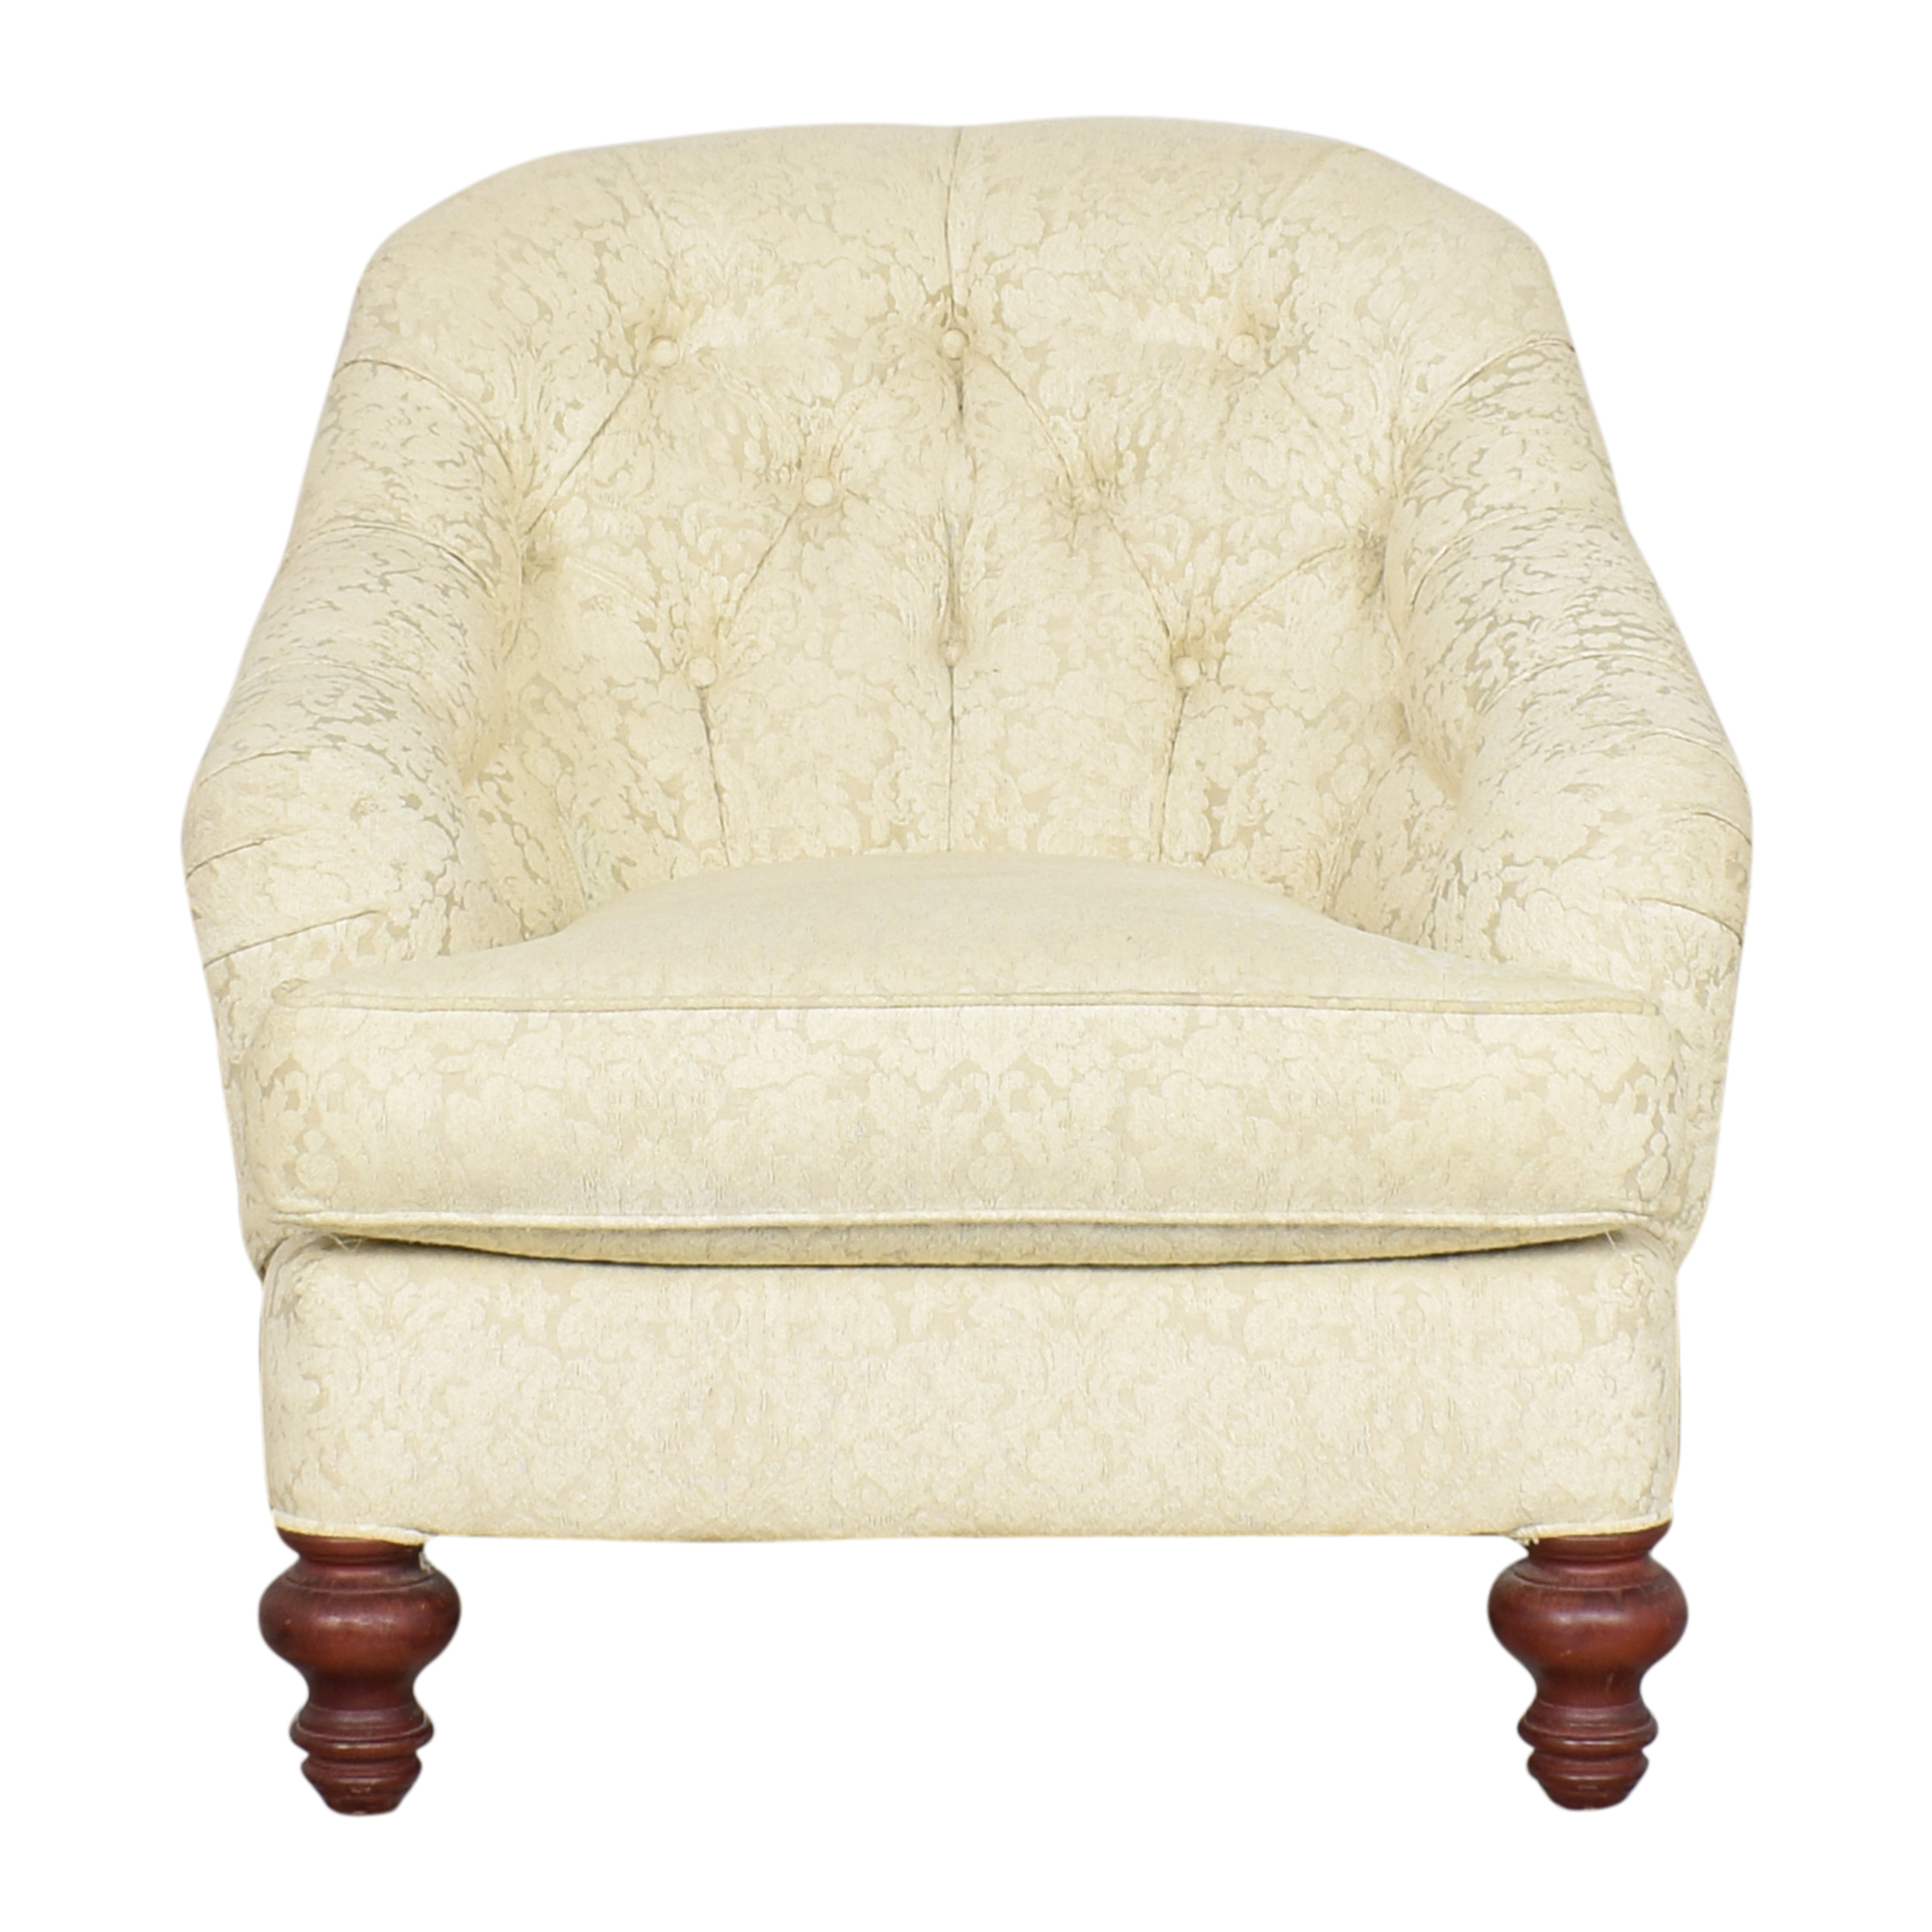 ABC Carpet & Home ABC Carpet & Home Mitchell Gold Accent Chair Chairs